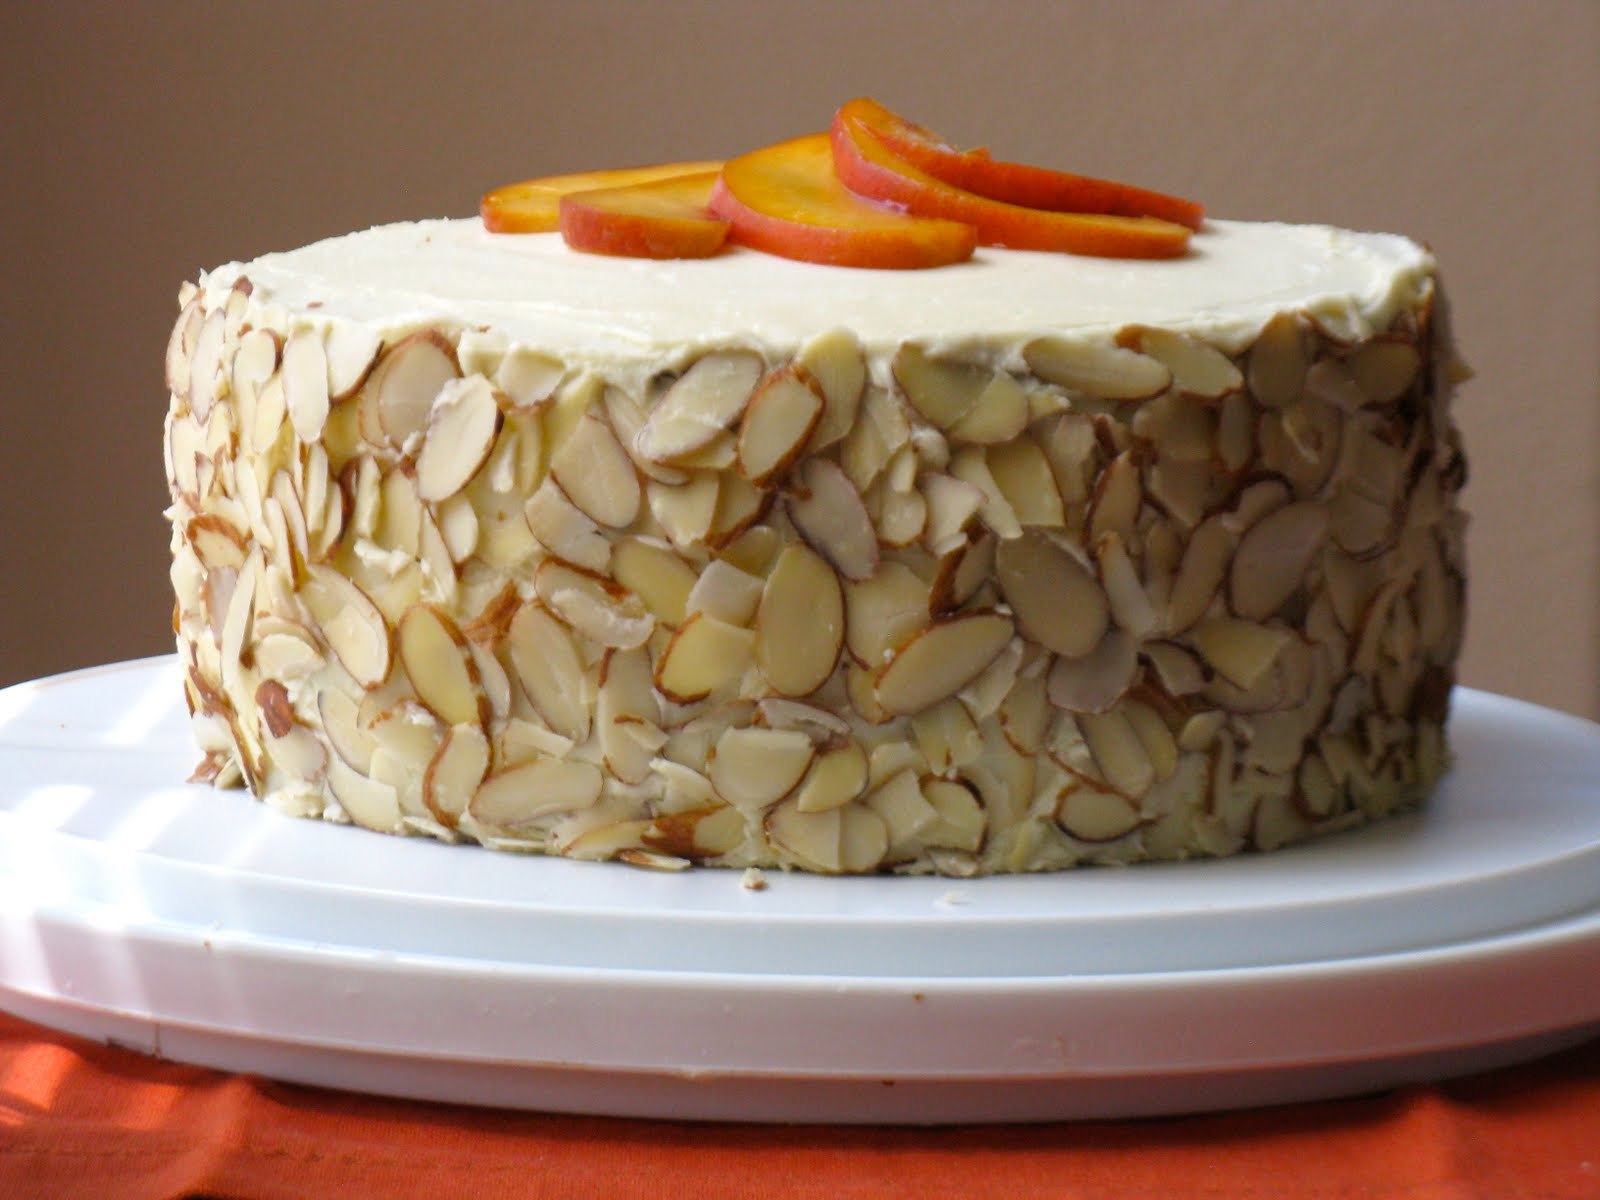 White Layered Cake Recipes: The Cilantropist: White Chocolate Layer Cake With Apricot